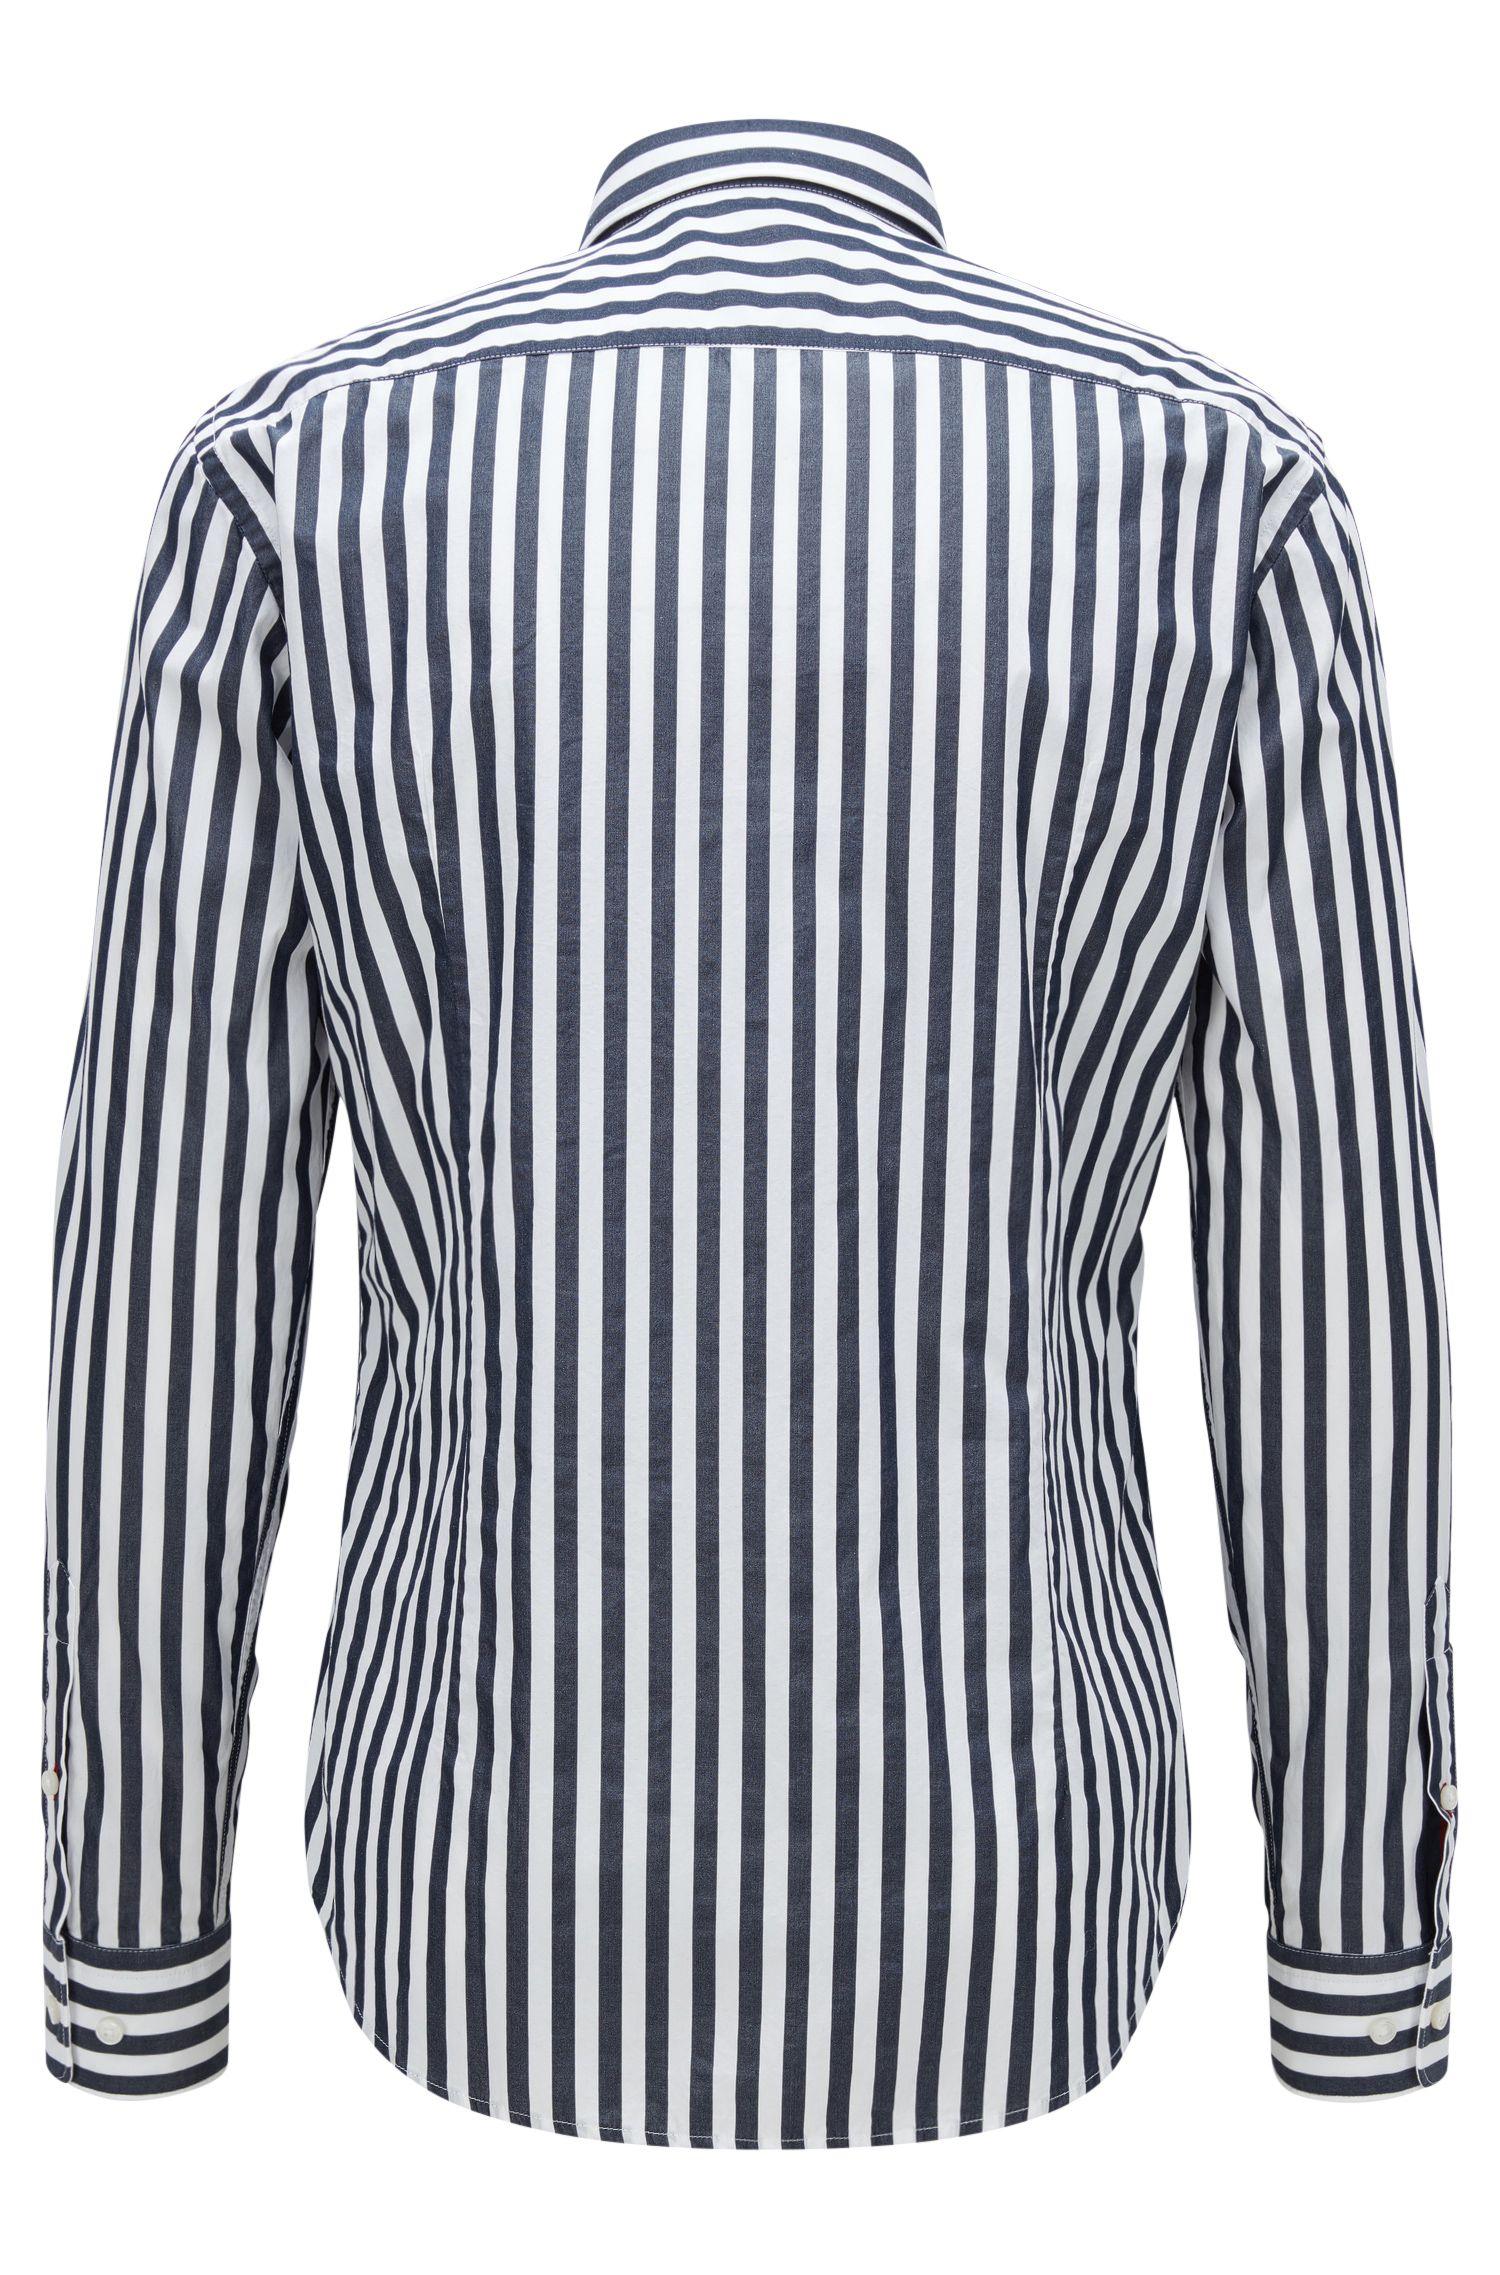 Cotton Button Down Shirt, Slim Fit | Ronni